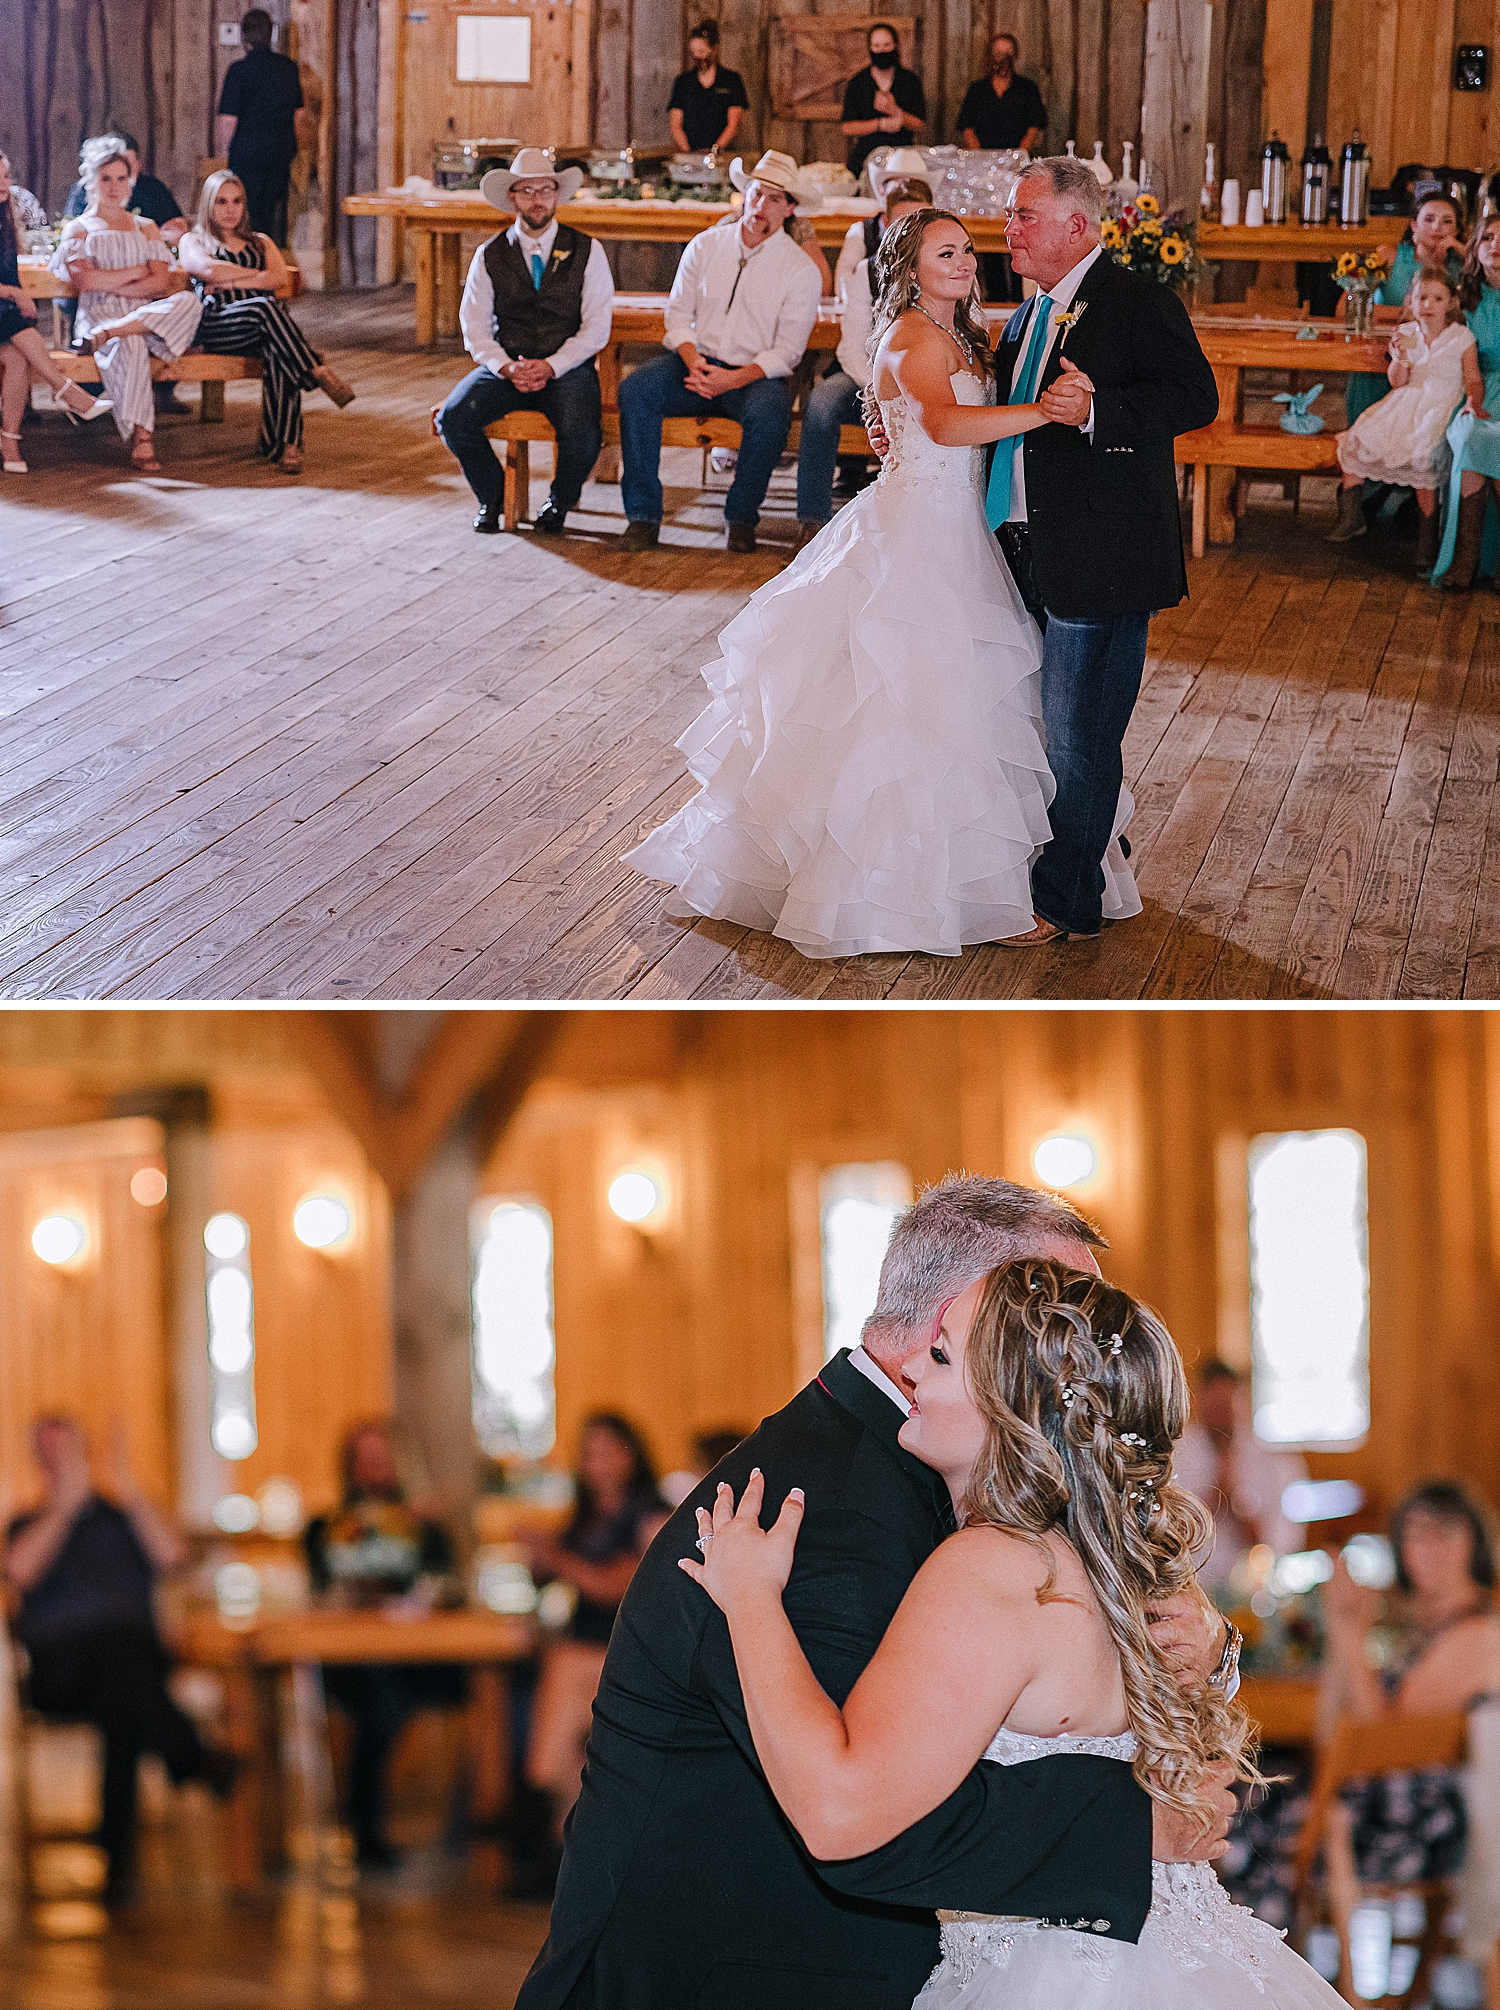 Carly-Barton-Photography-Old-Town-Texas-Rustic-Wedding-Photos-Sunflowers-Boots-Kyle-Texas_0111.jpg